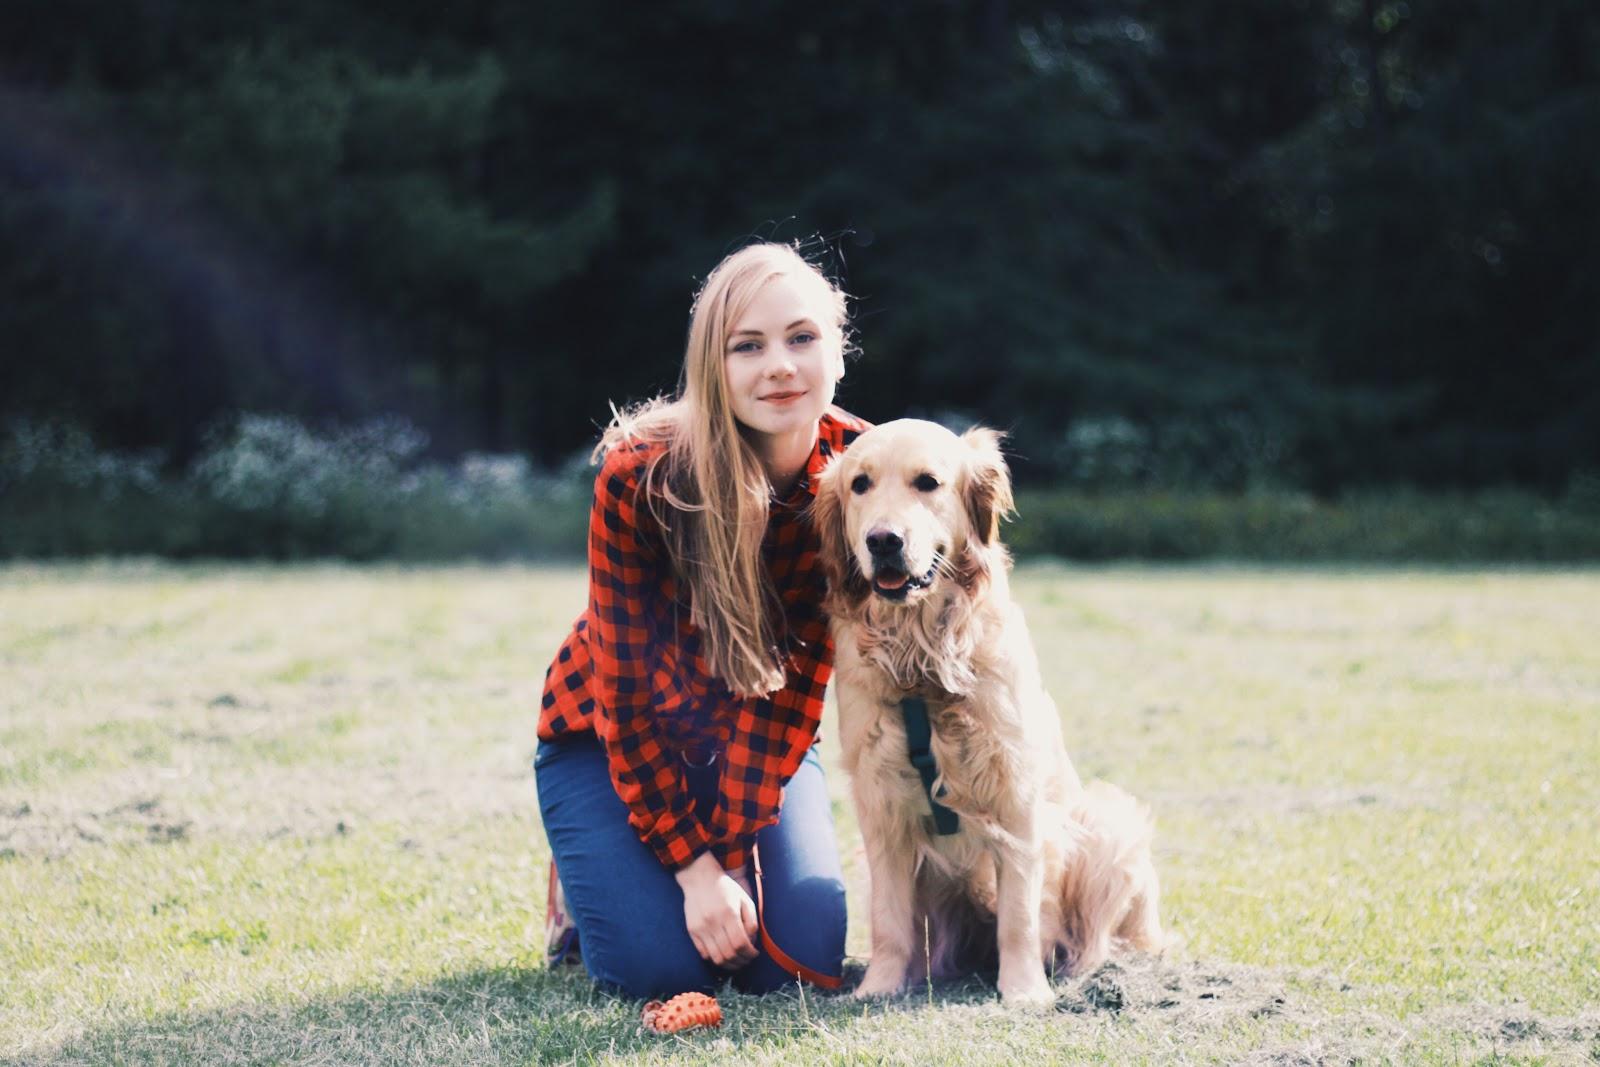 Как работает сервис по выгулу собак «Собака-гуляка» - 1